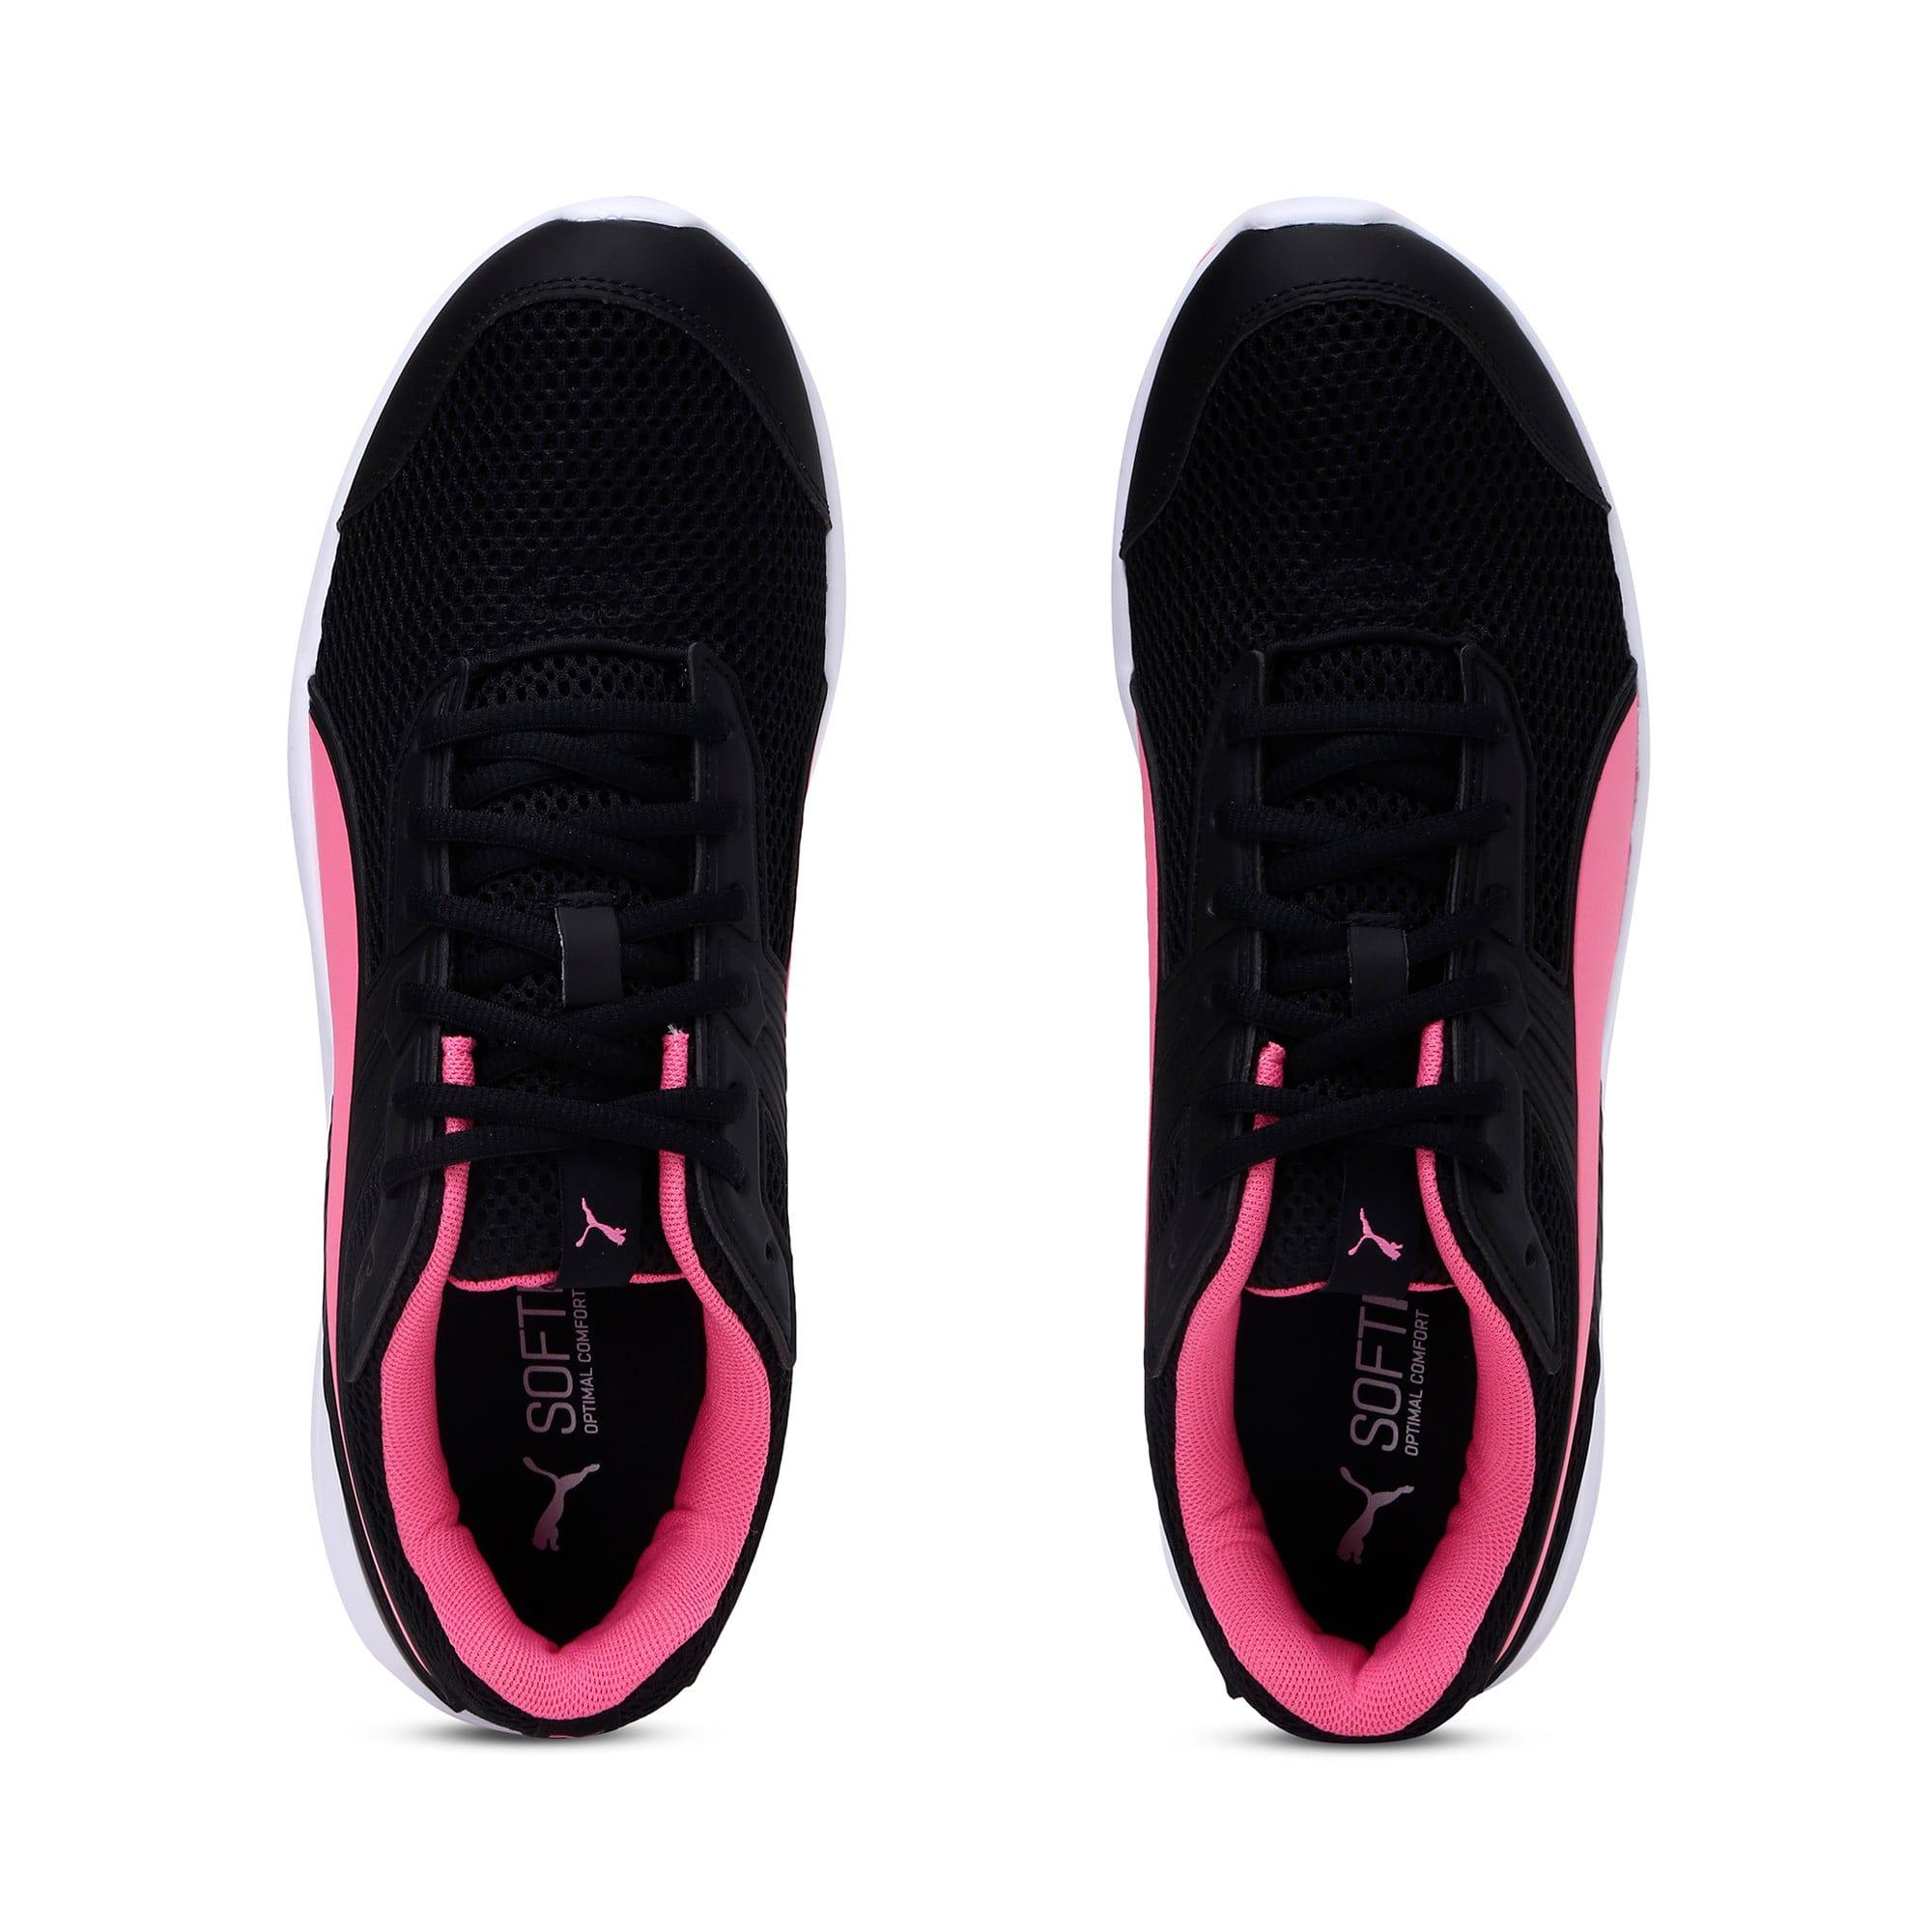 Thumbnail 8 of Escaper Training Shoes, Puma Black-Azalea Pink-White, medium-IND